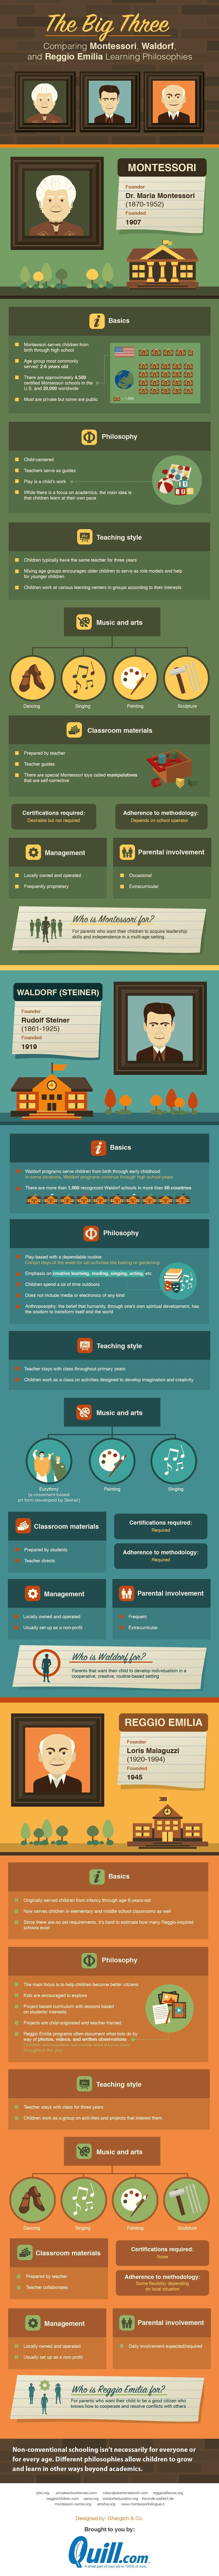 The Big Three: Comparing Montessori, Waldorf, and Reggio Emilia Learning Philosophies